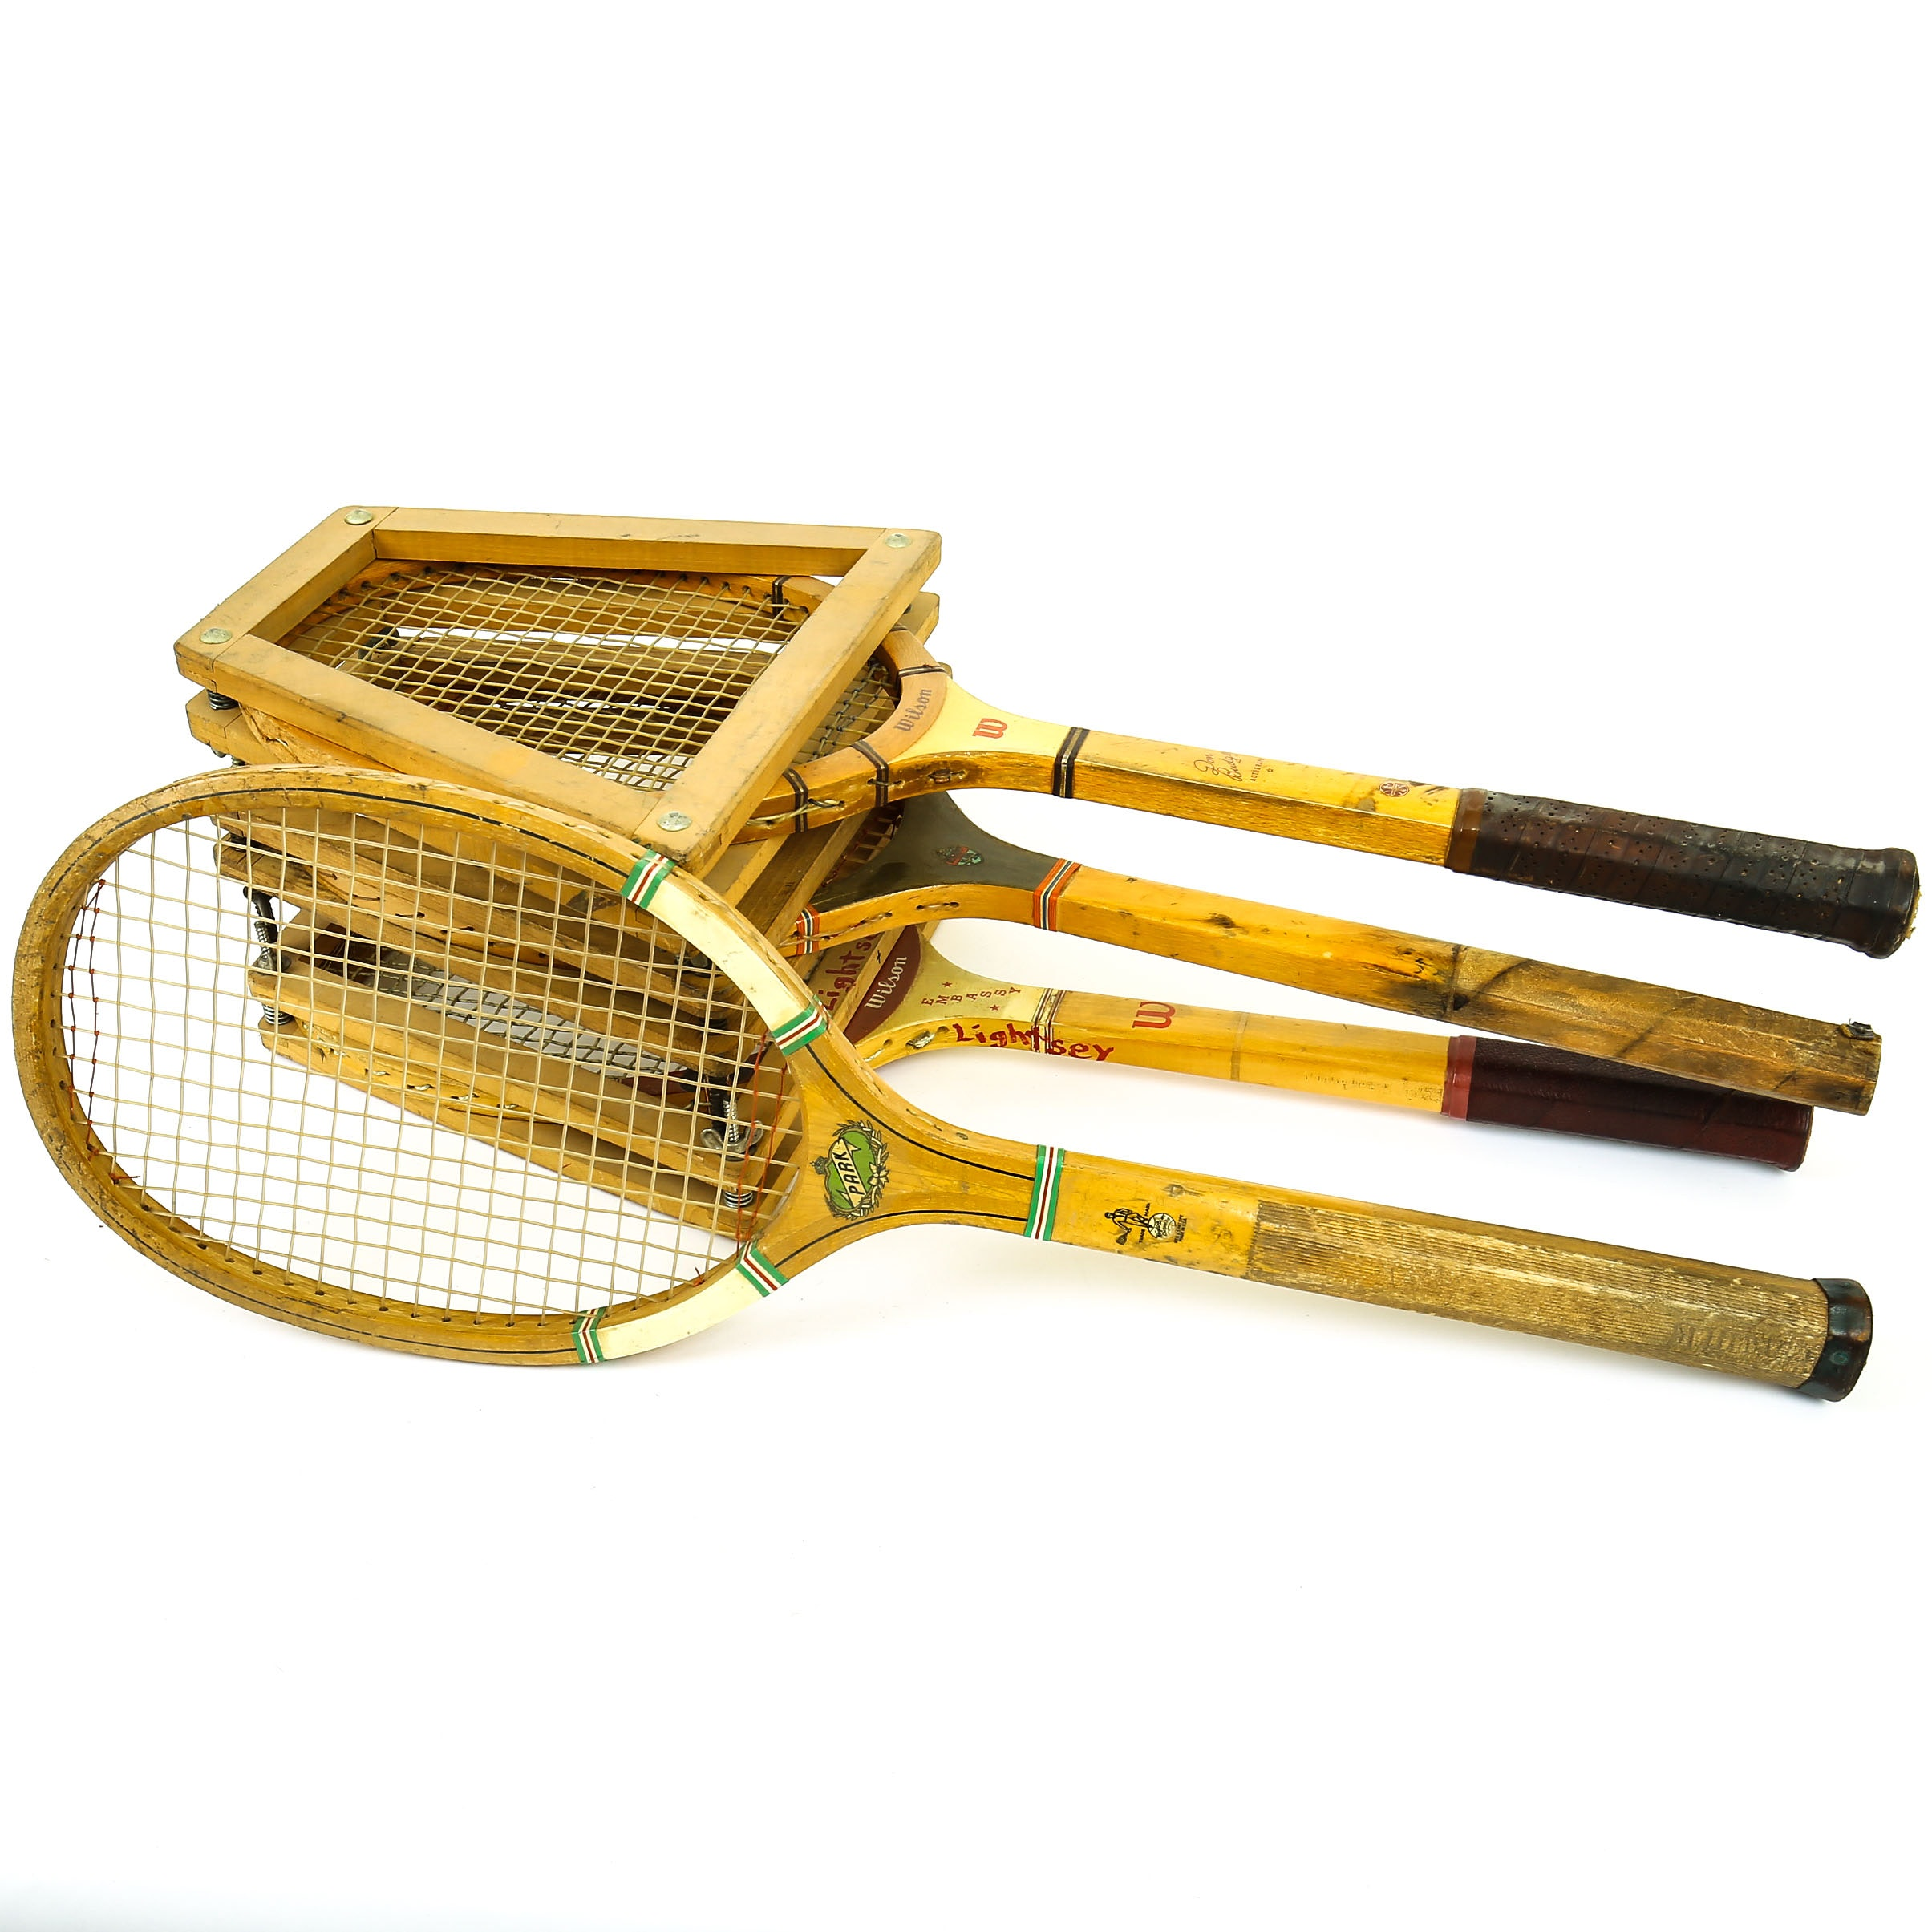 Variety of Vintage Tennis Rackets